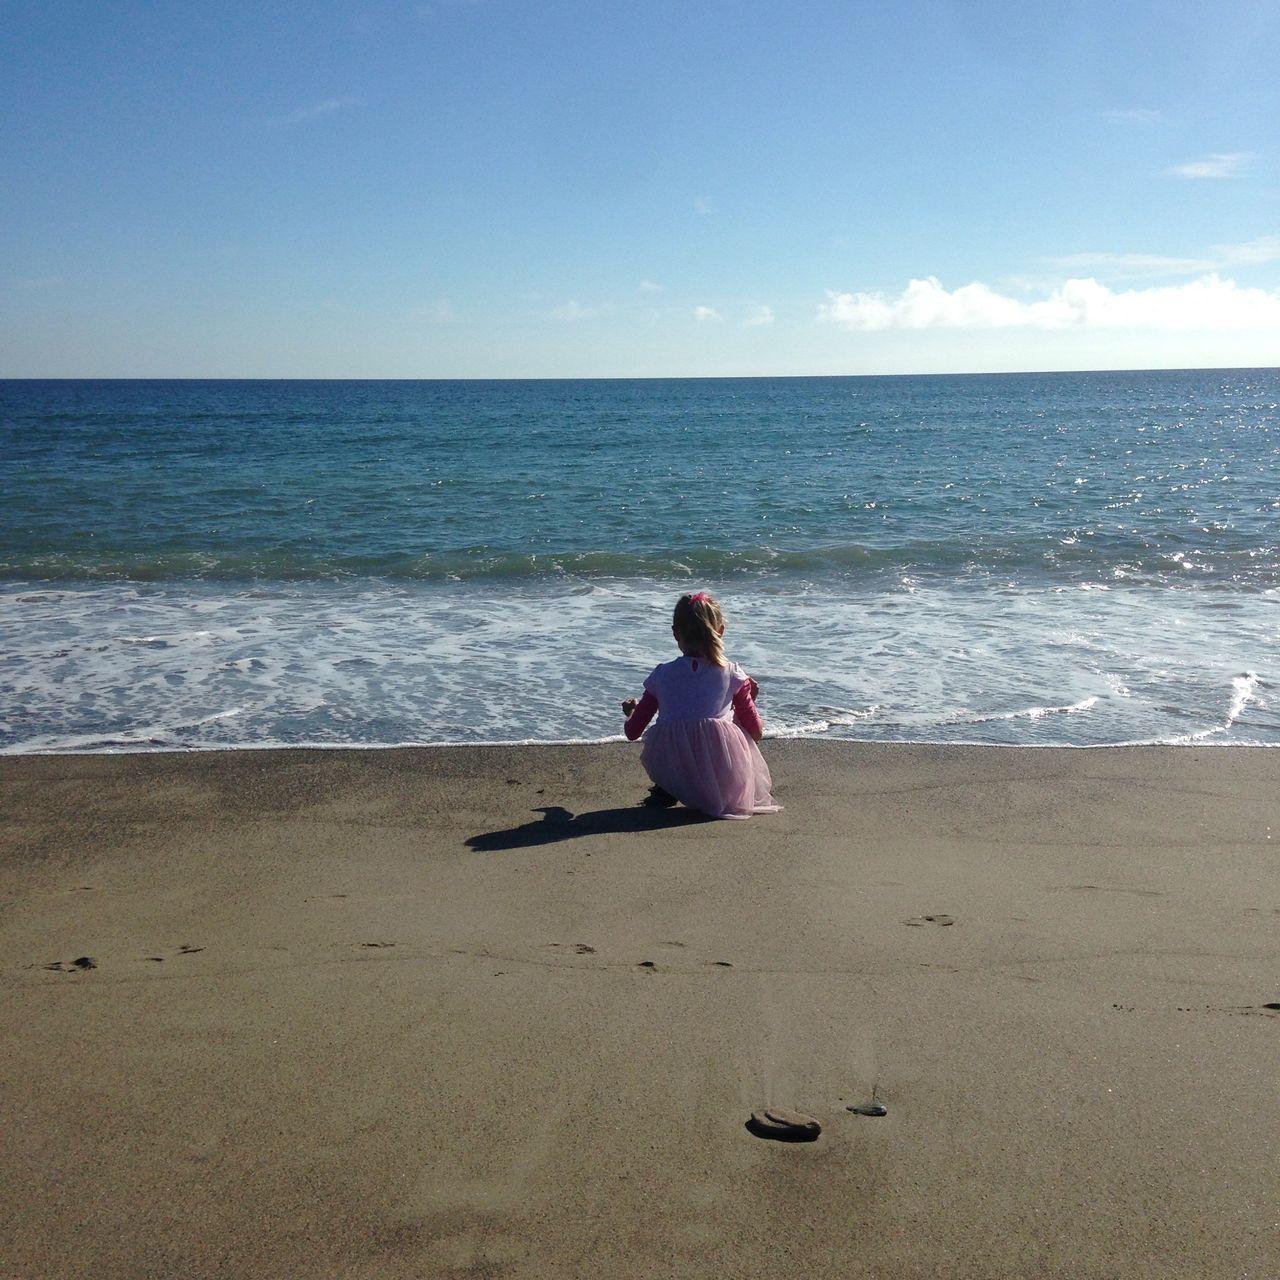 Rear View Of Girl Crouching On Seashore Against Sky